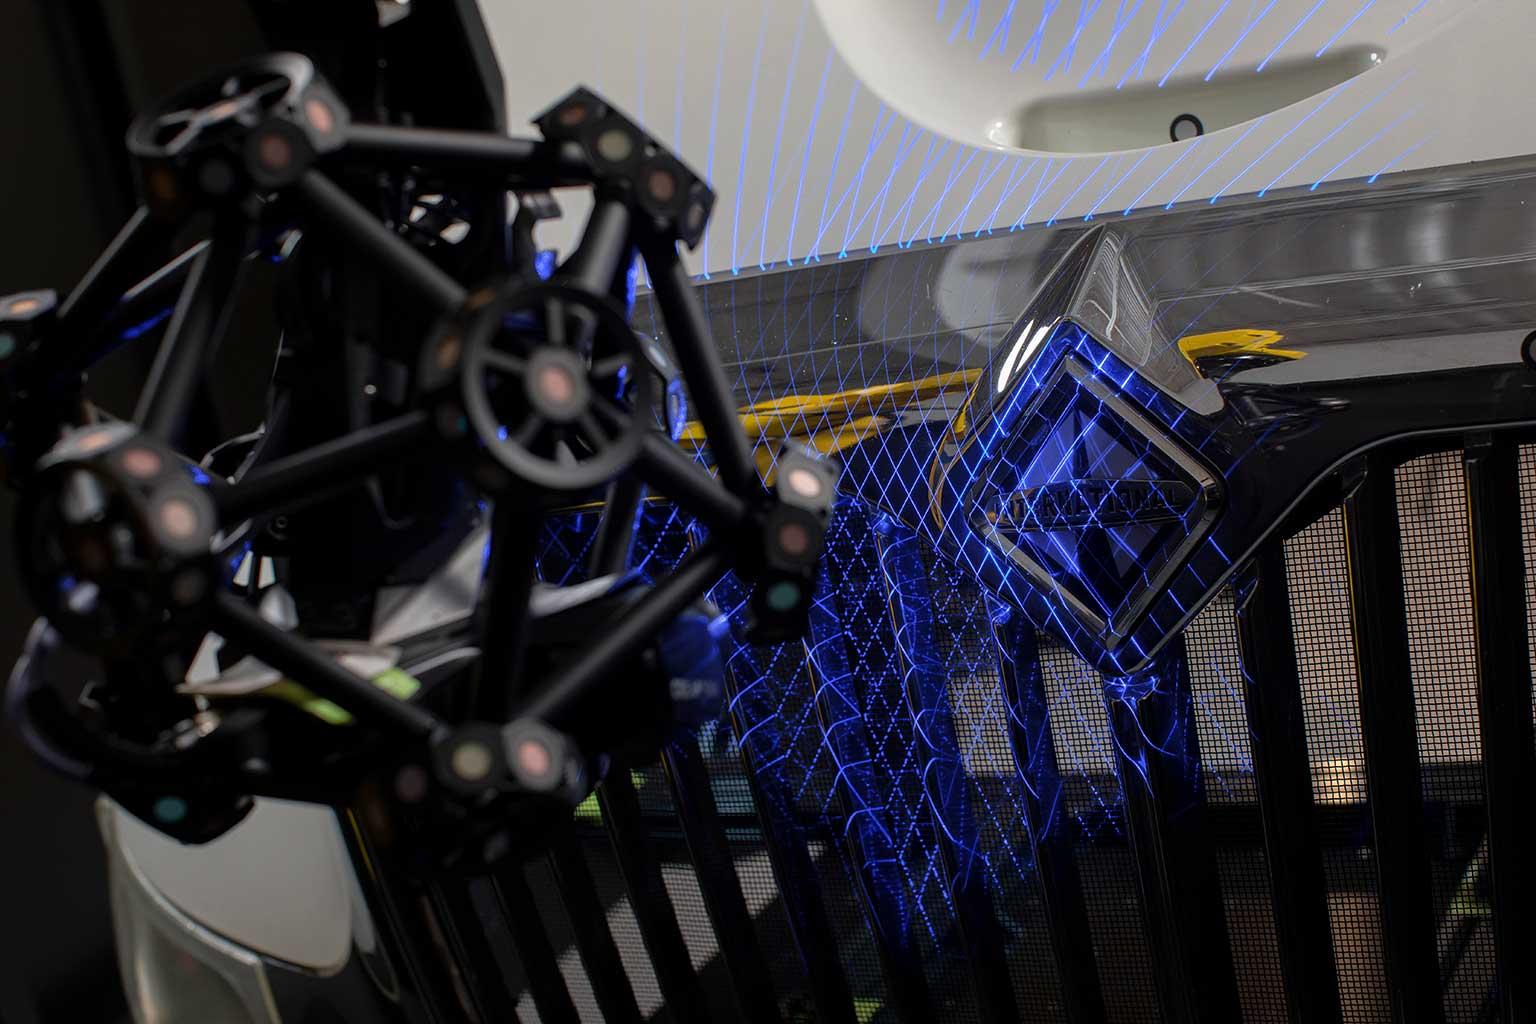 R-series robot mounted MetraSCAN 3D optical CMM scanning shiny bumper and hood of white International truck